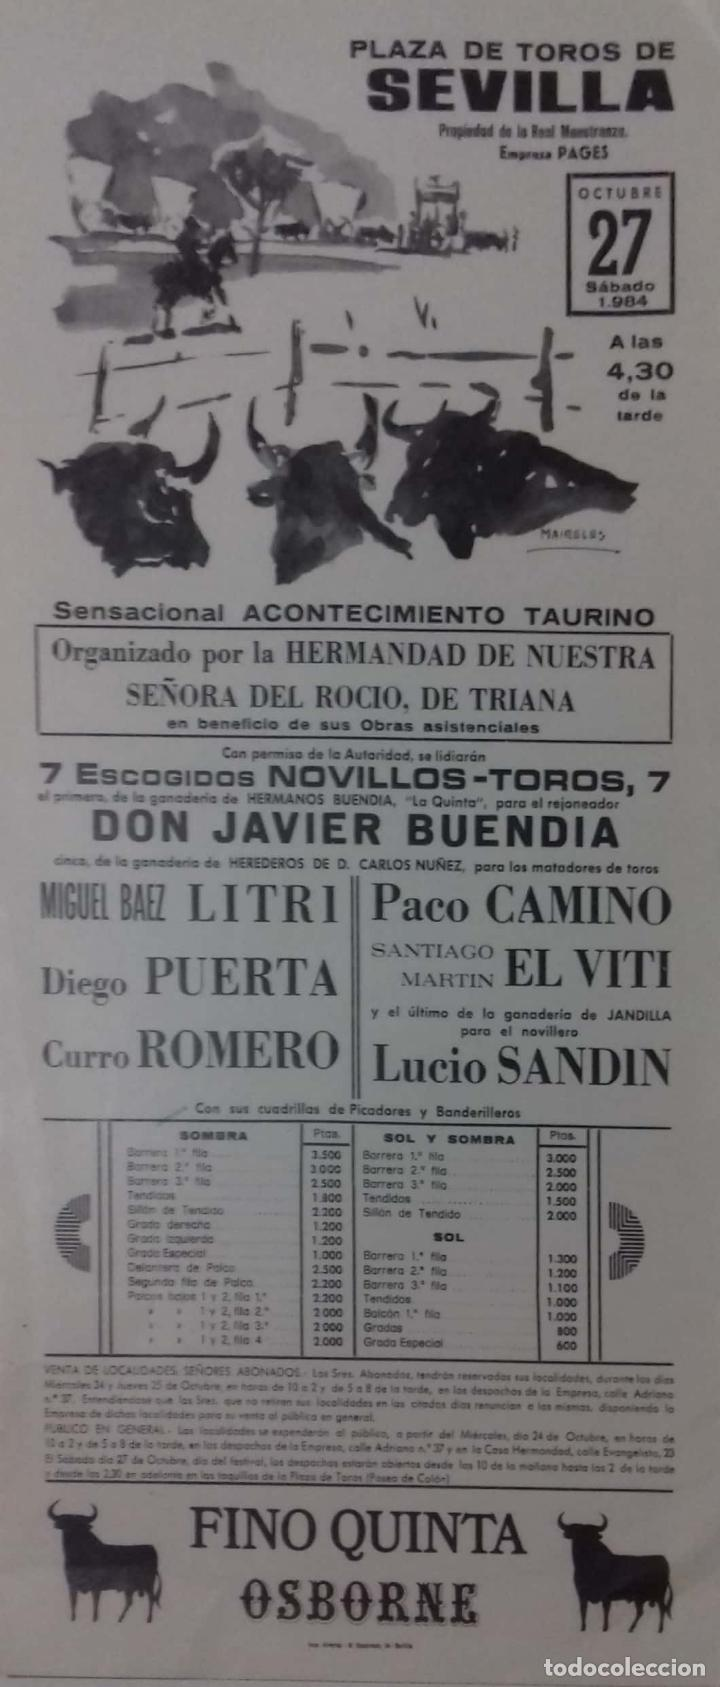 CARTEL. PLAZA TOROS DE SEVILLA. 1984. LEER. (Coleccionismo - Carteles Gran Formato - Carteles Toros)